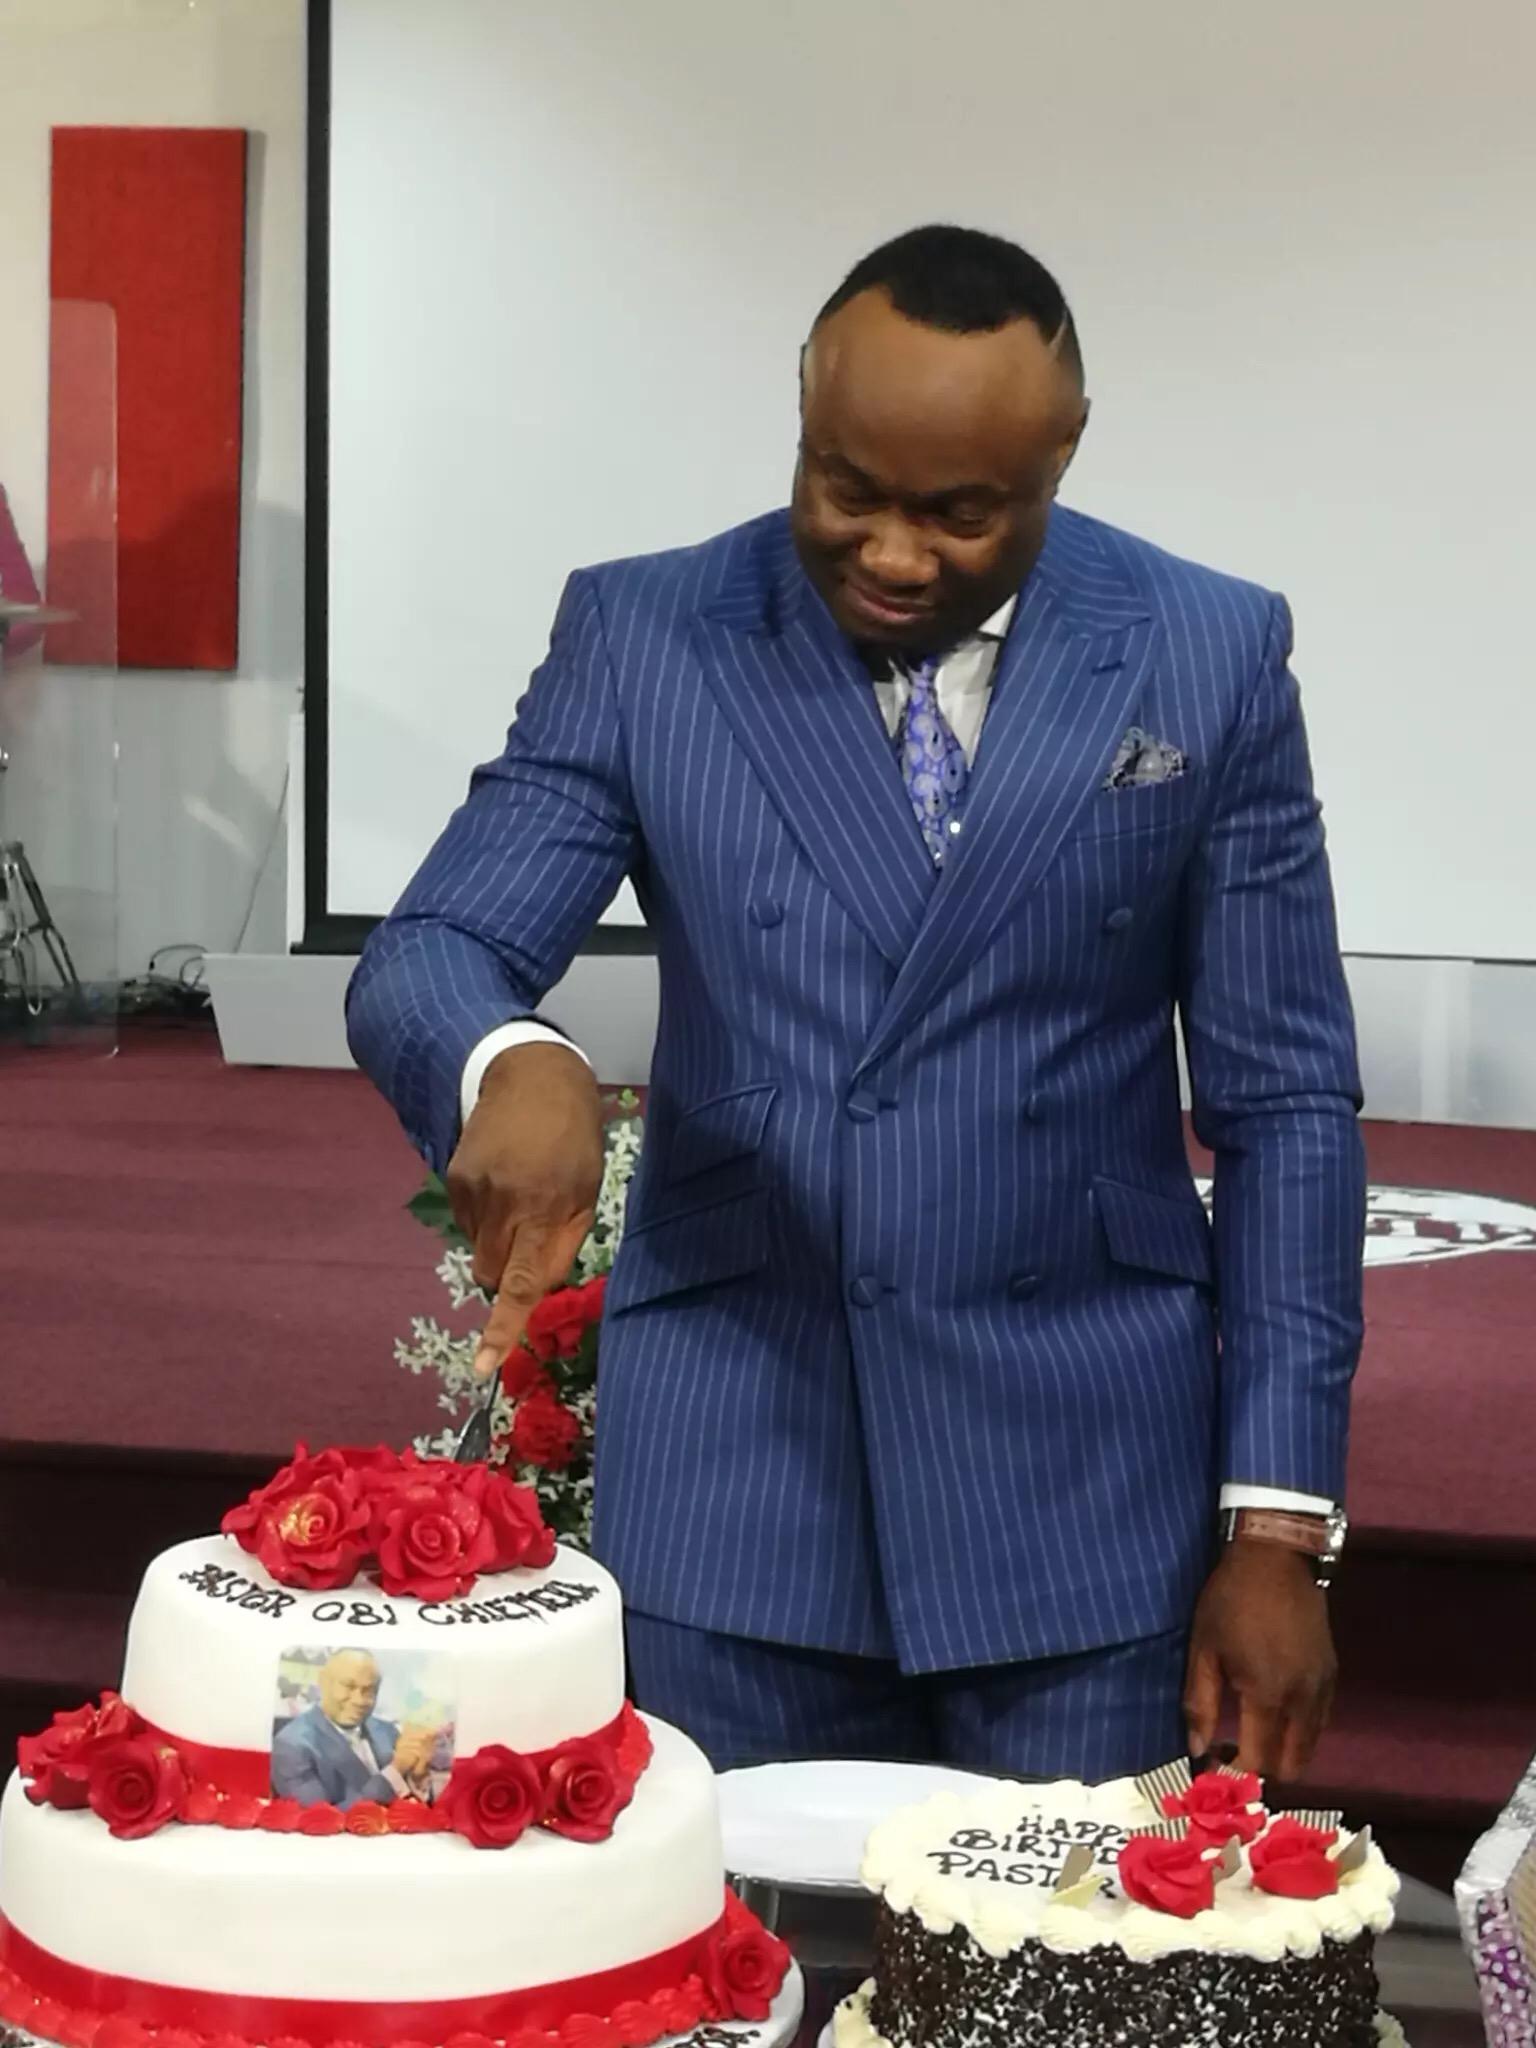 Happy Birthday a man that